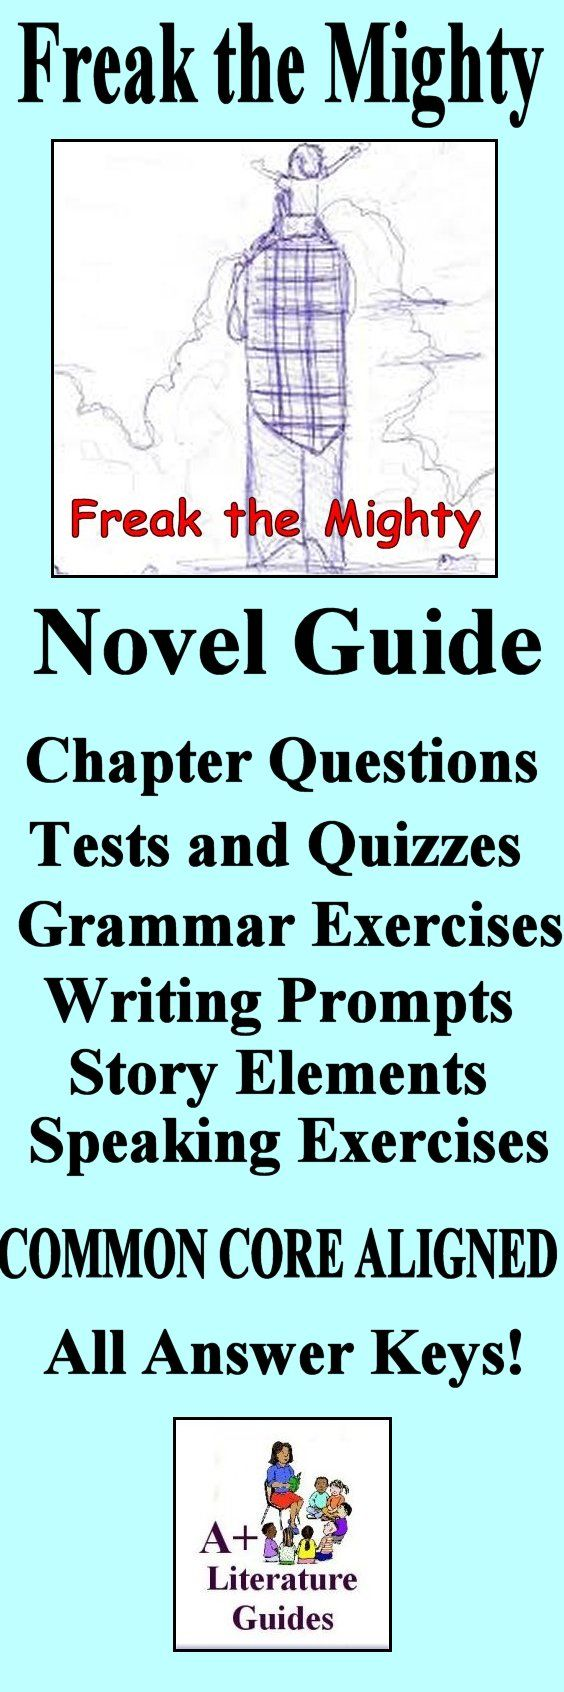 Free Worksheet Freak The Mighty Worksheets 17 best ideas about freak the mighty on pinterest reading novel study unit